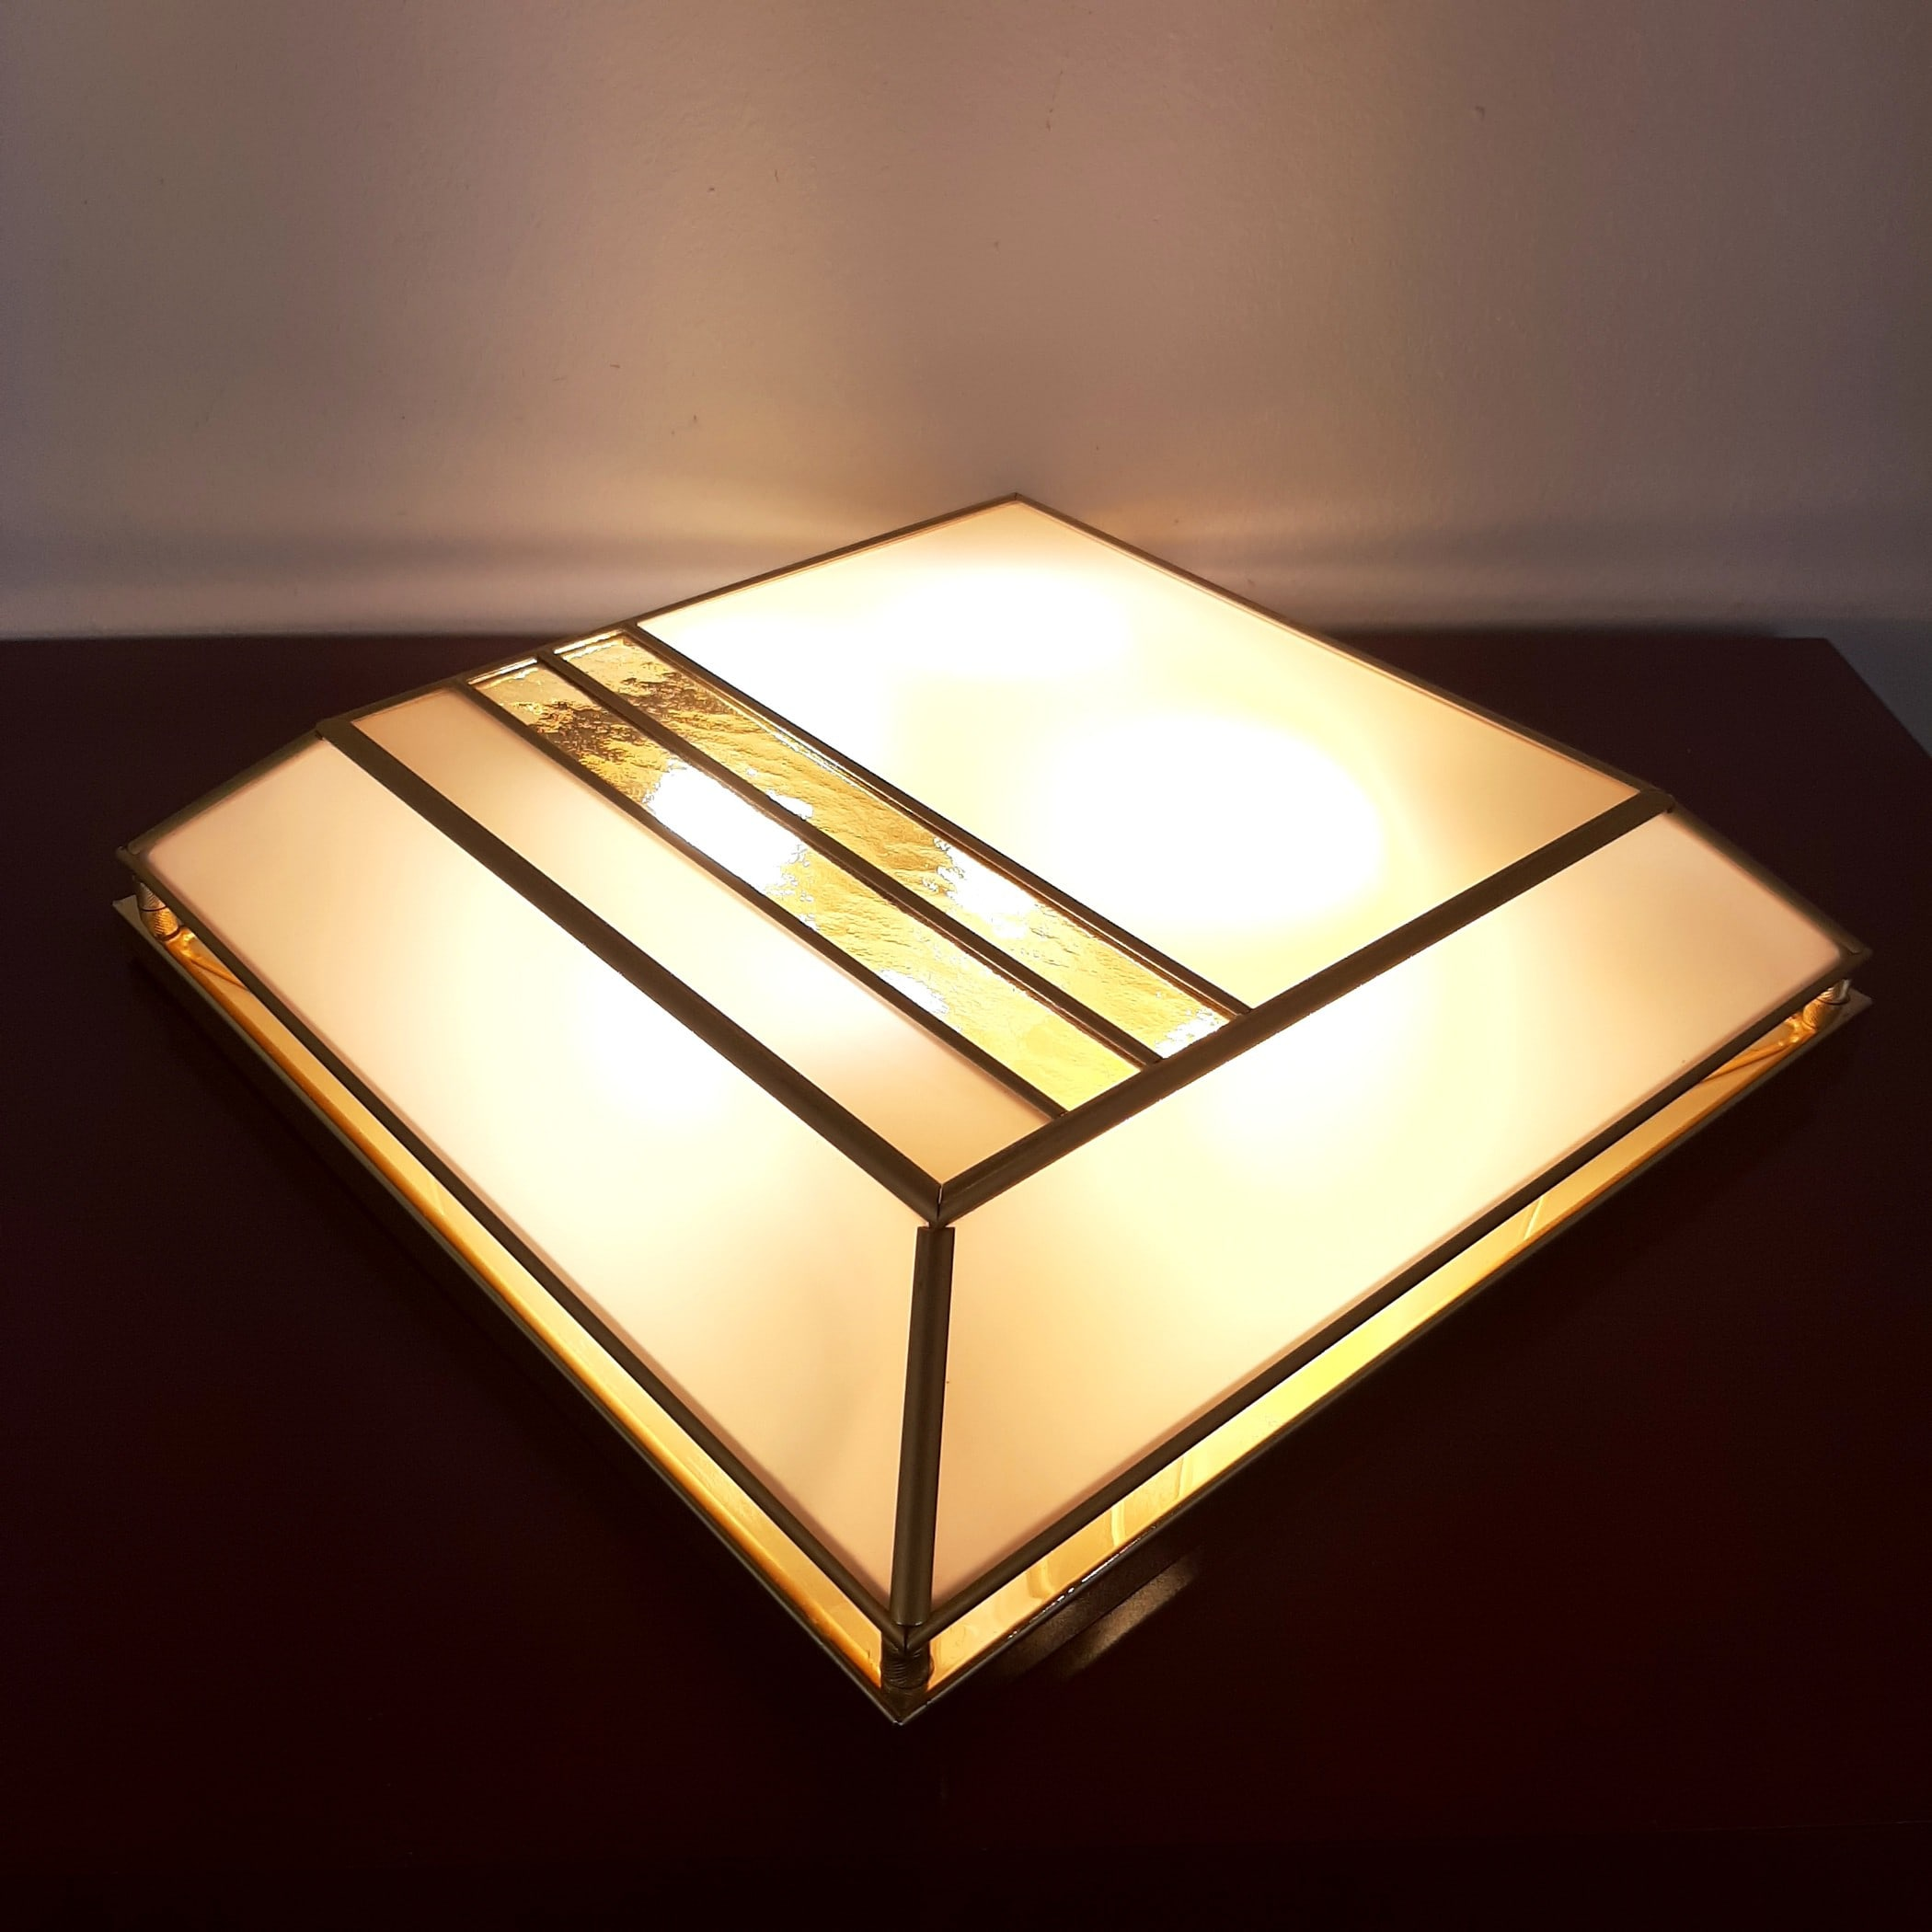 Retro ceiling lamp Gold and White Italy 1980s Wall lamp Mid-century lighting italian design